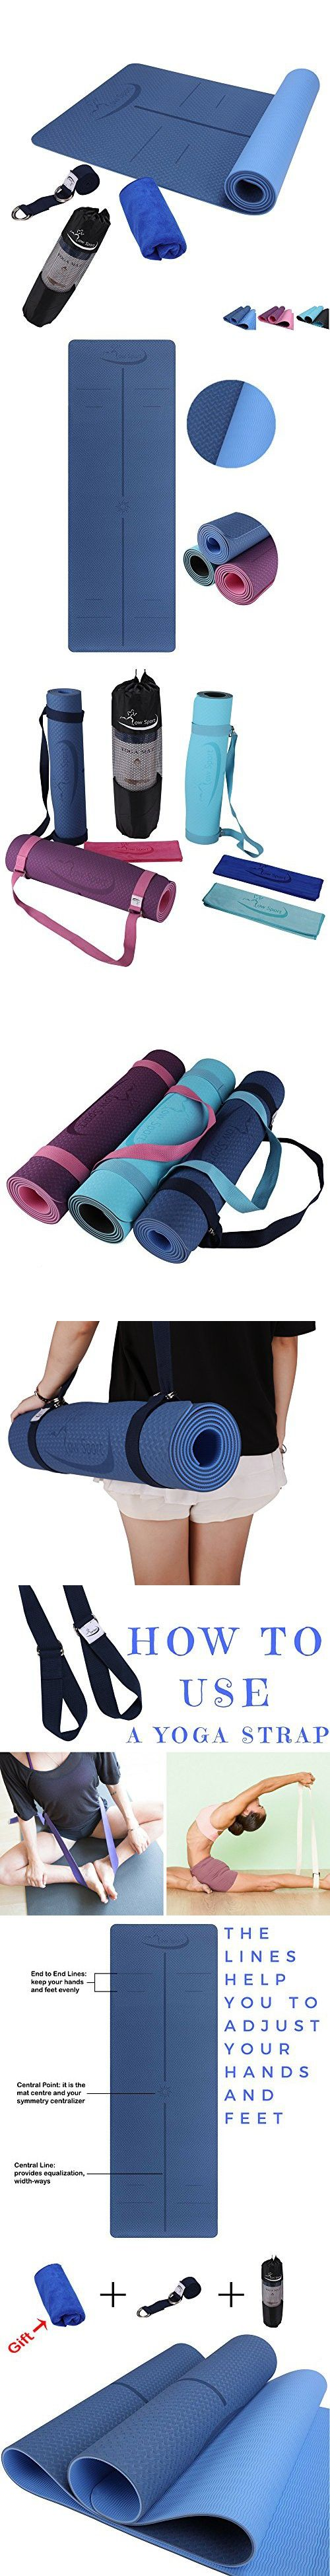 Hot Yoga Mat Set By Low Sport 100 Tpe Yoga Mat Strap Carrying Bag Free Bonus Yoga Hand Towel Non Slip Eco Friendly Super Elastic Yoga Mats For Women Hot